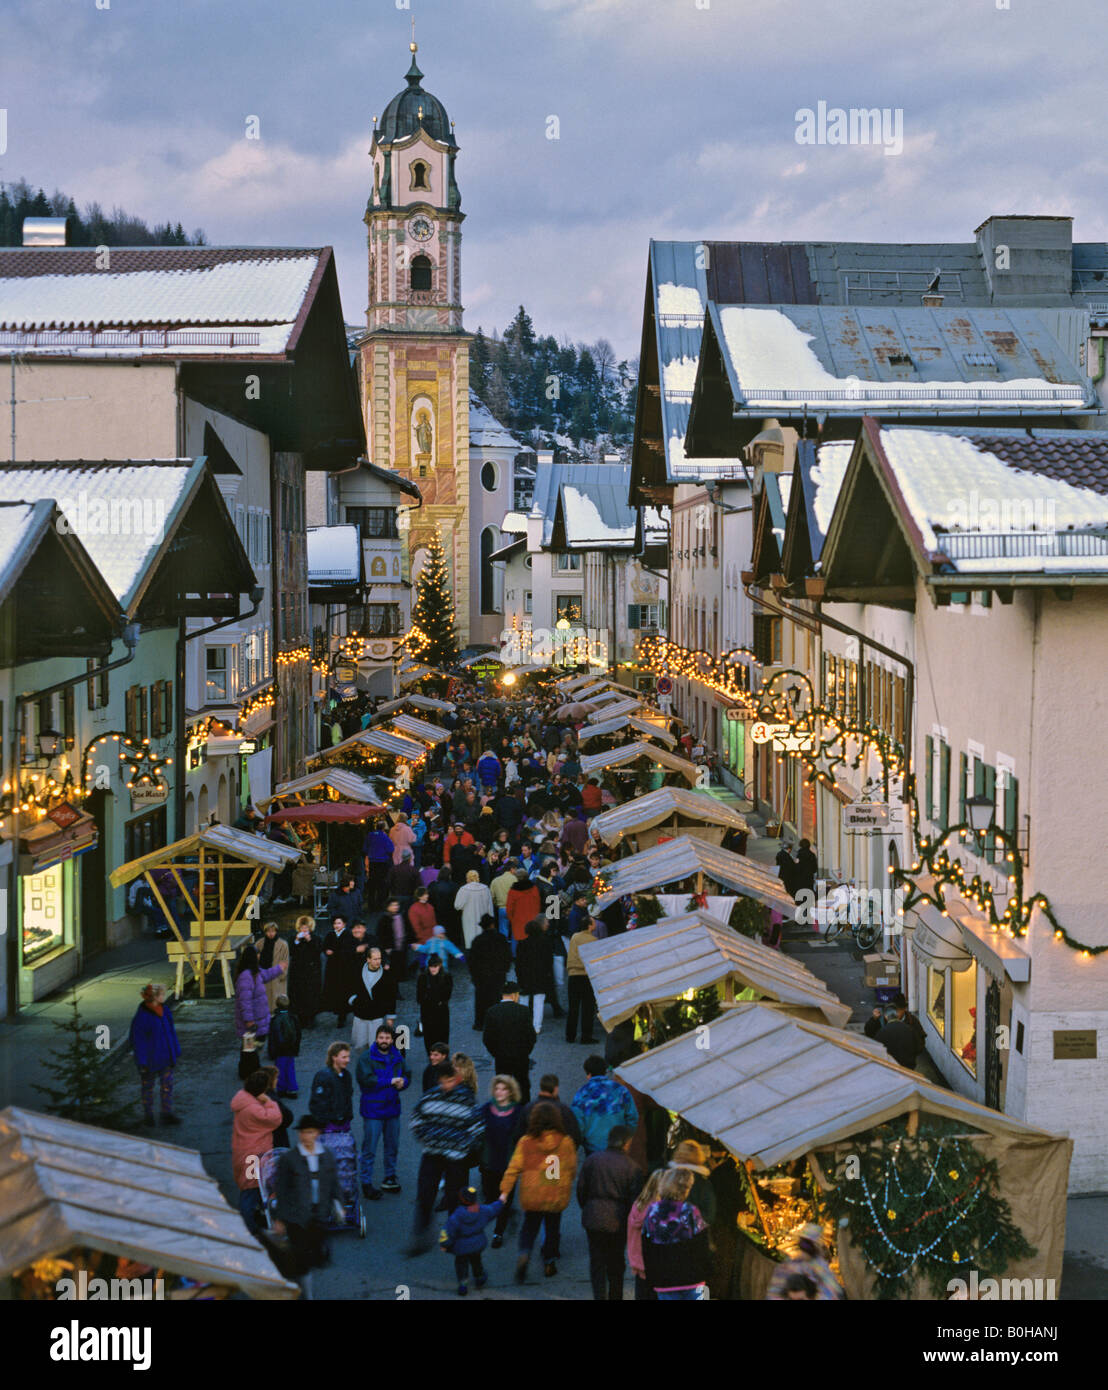 Christmas market in Mittenwald, Pfarrkirche, St. Peter and Paul Parish Church, Upper Bavaria, Bavaria, Germany - Stock Image